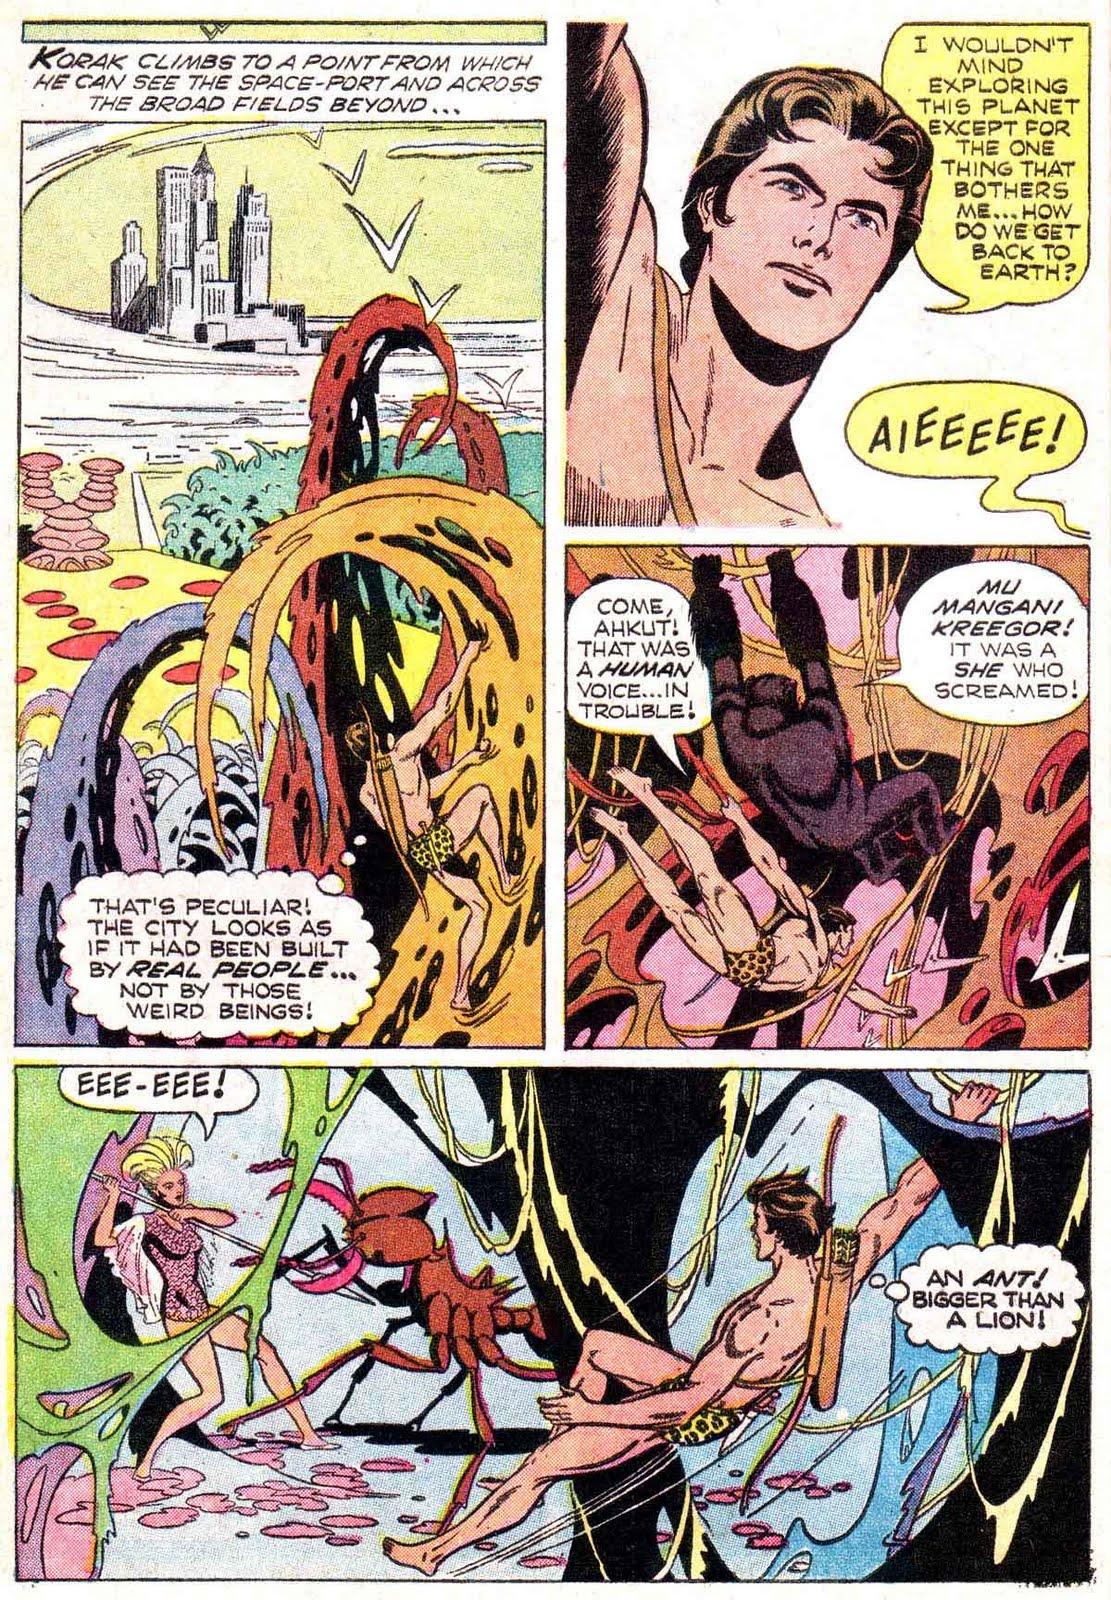 Korak Son of Tarzan v1 #21 gold key silver age 1960s comic book page art by Russ Manning